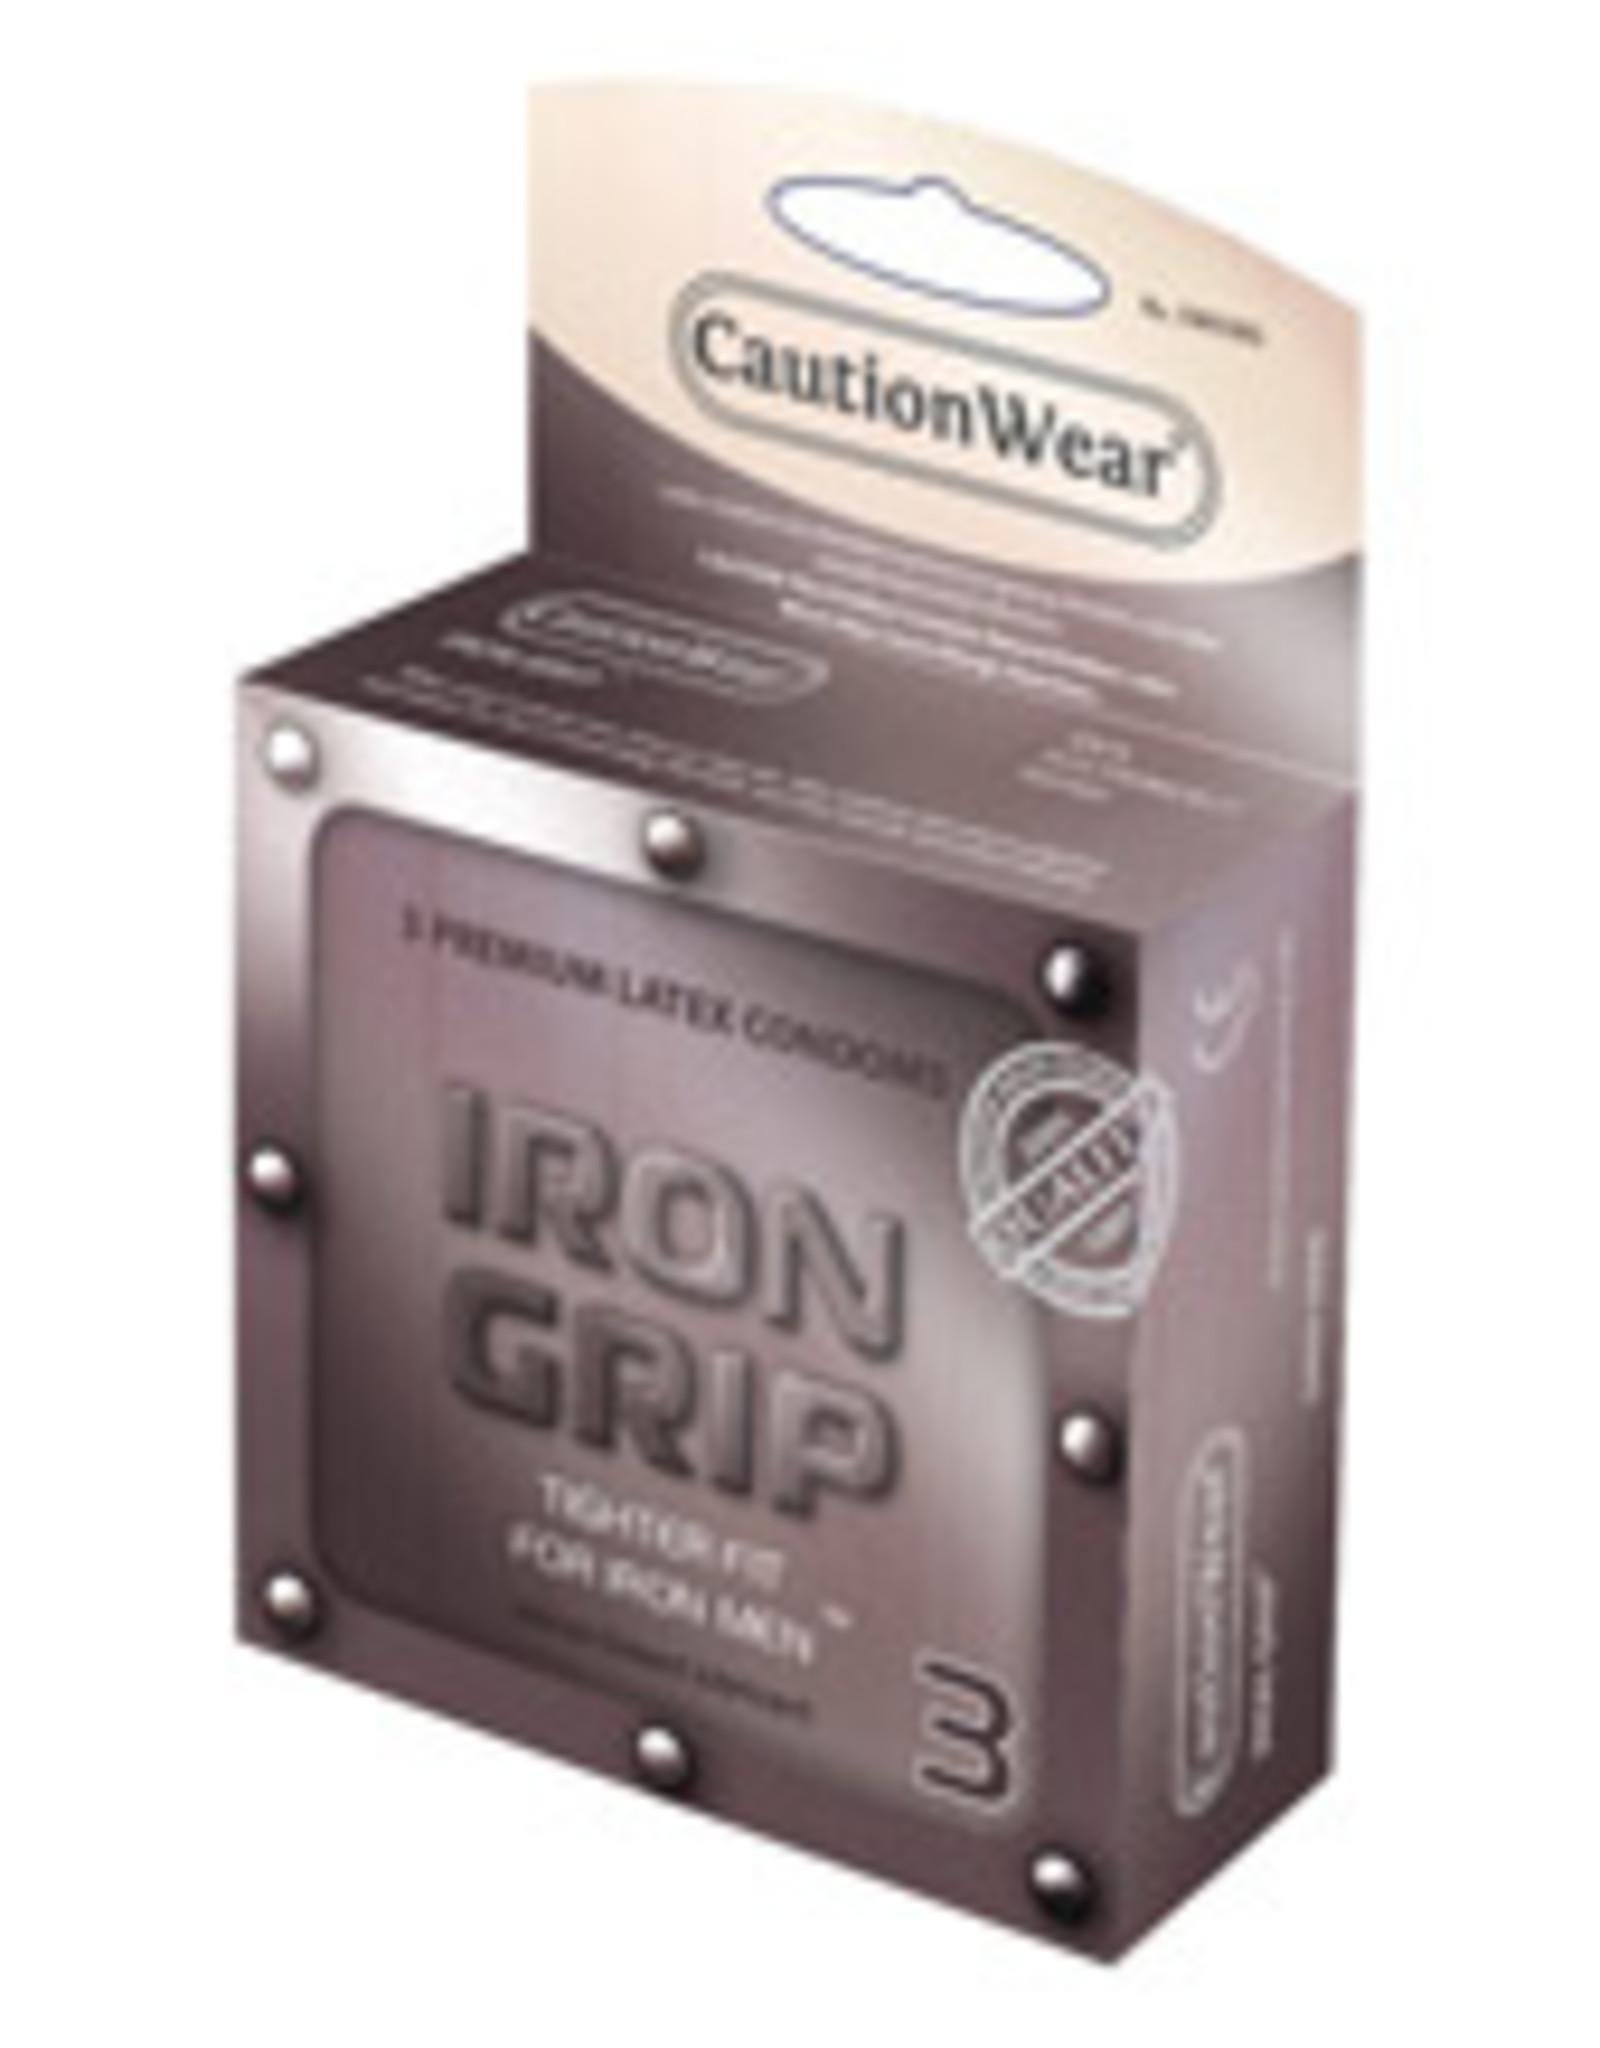 Caution Wear Iron Grip Snug Fit 3pk